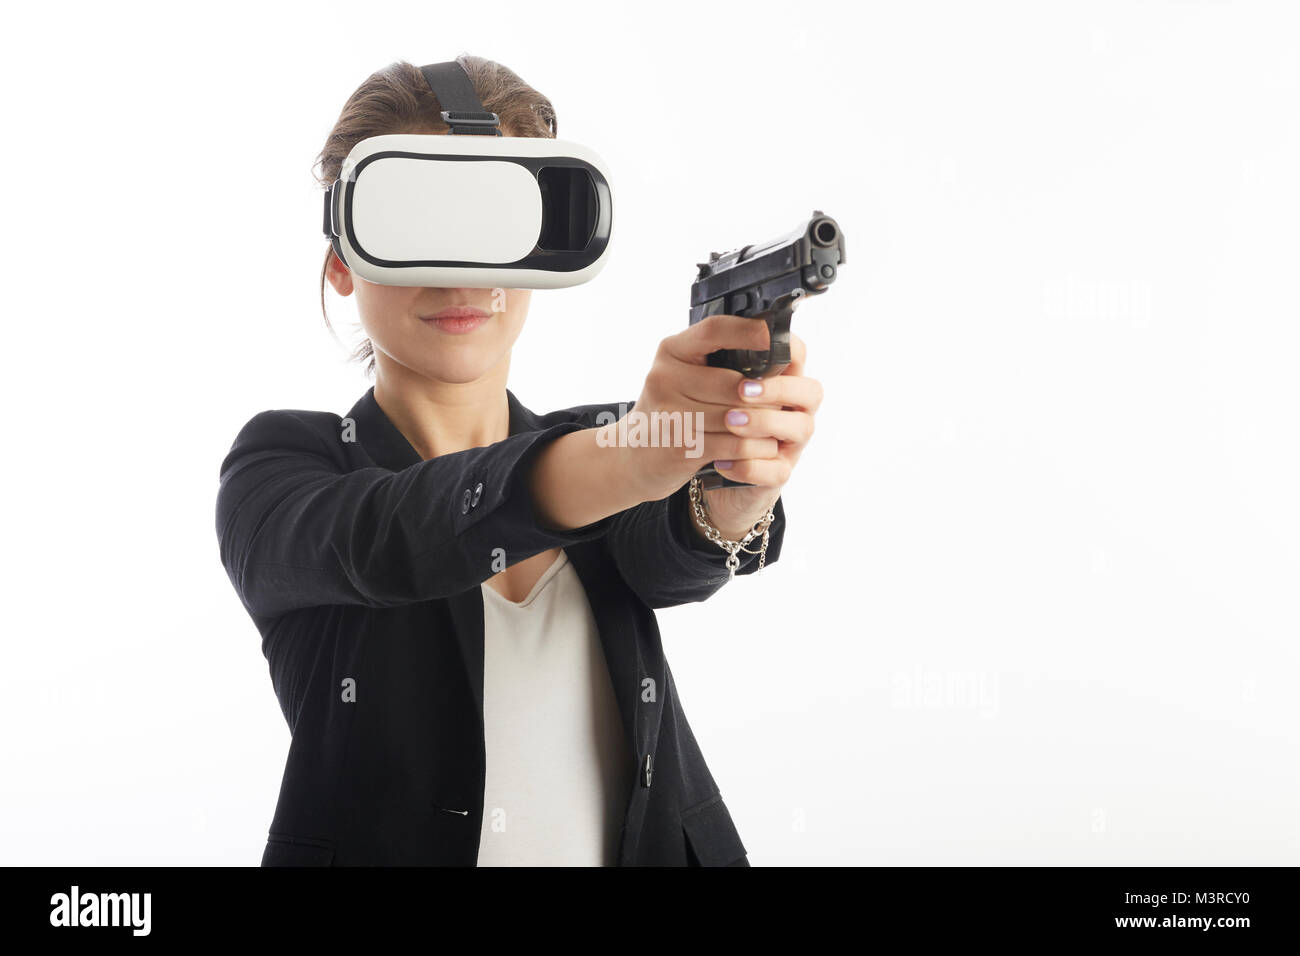 woman agent using virtual reality interface with gun Stock Photo